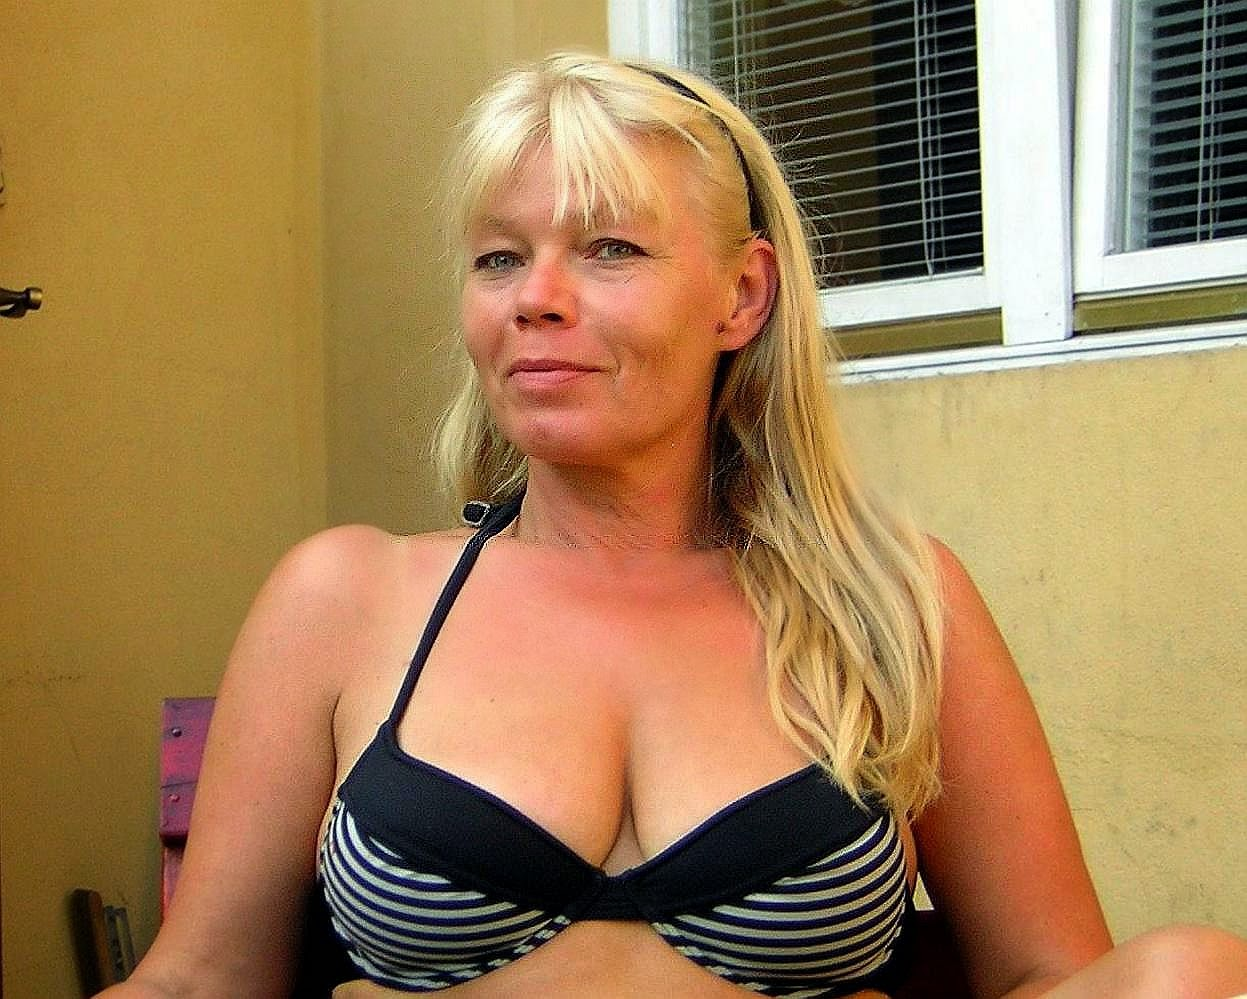 Woman To Man Spanish 55 50 Sexy Seeking